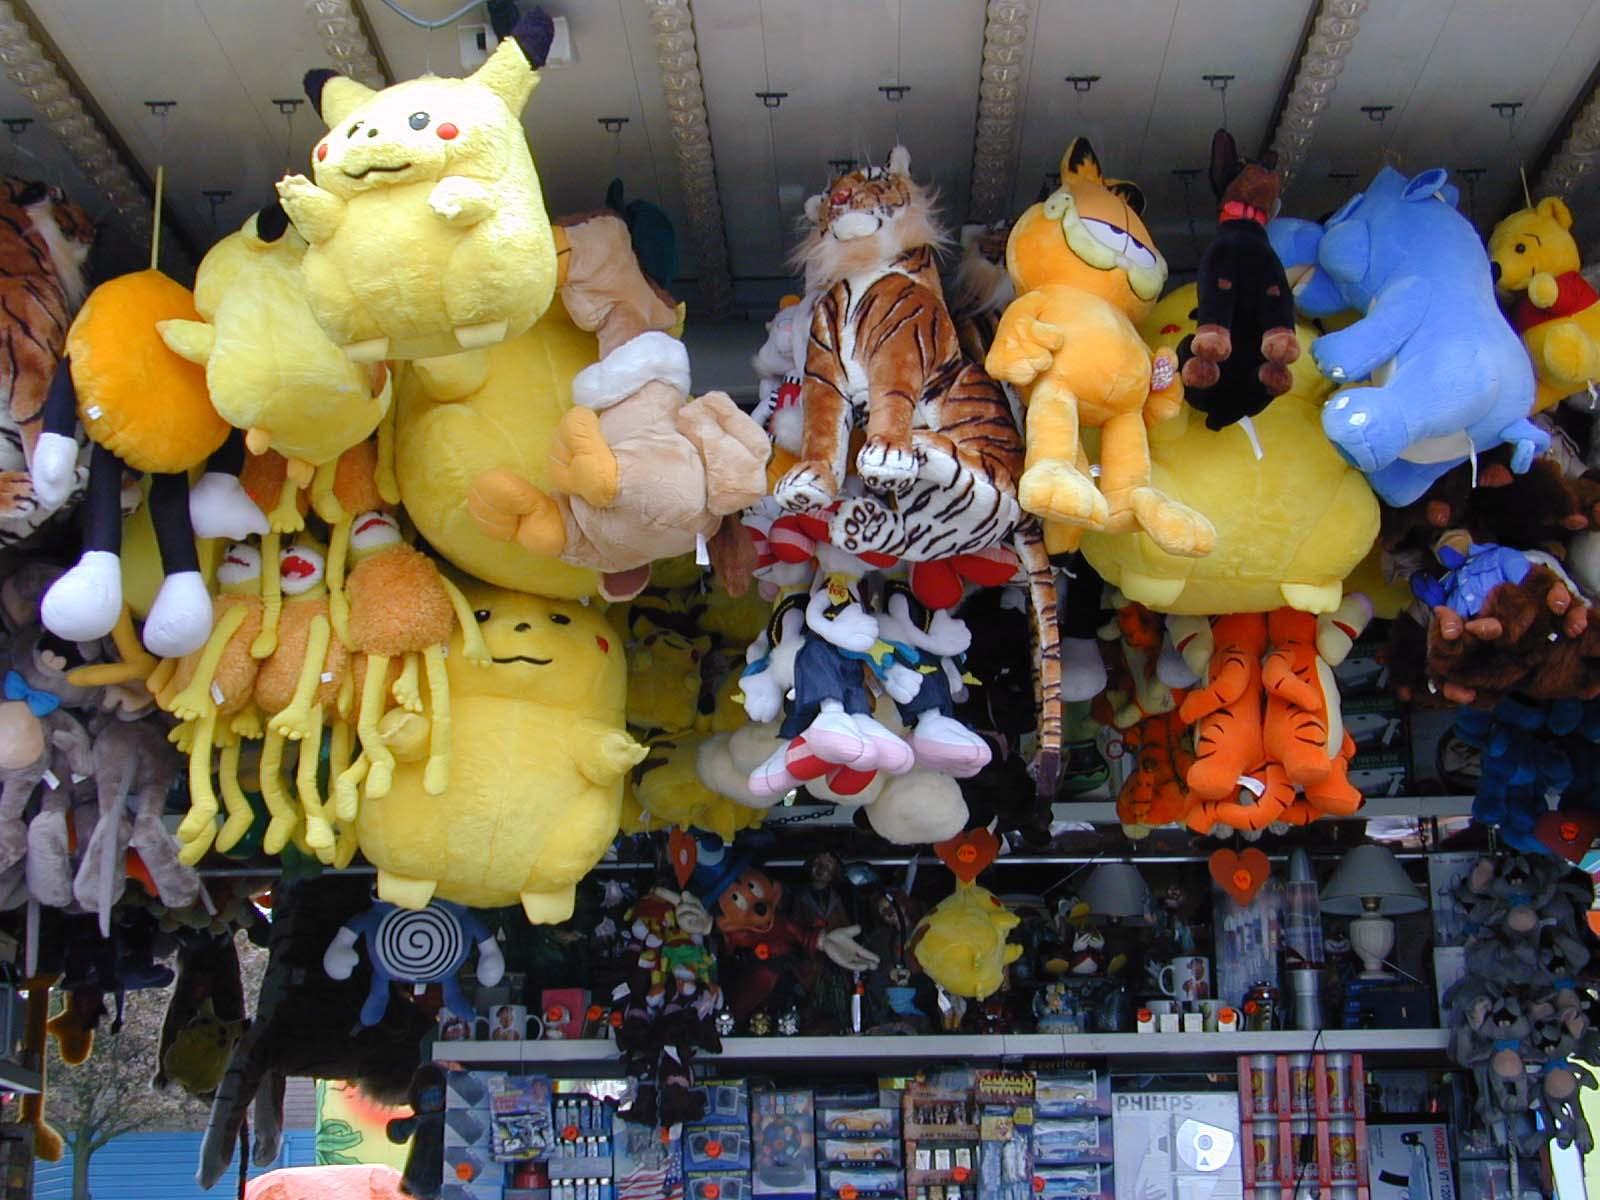 pluche fluffy funfair toys teddybear picachu garfield animals prize prizes tiger